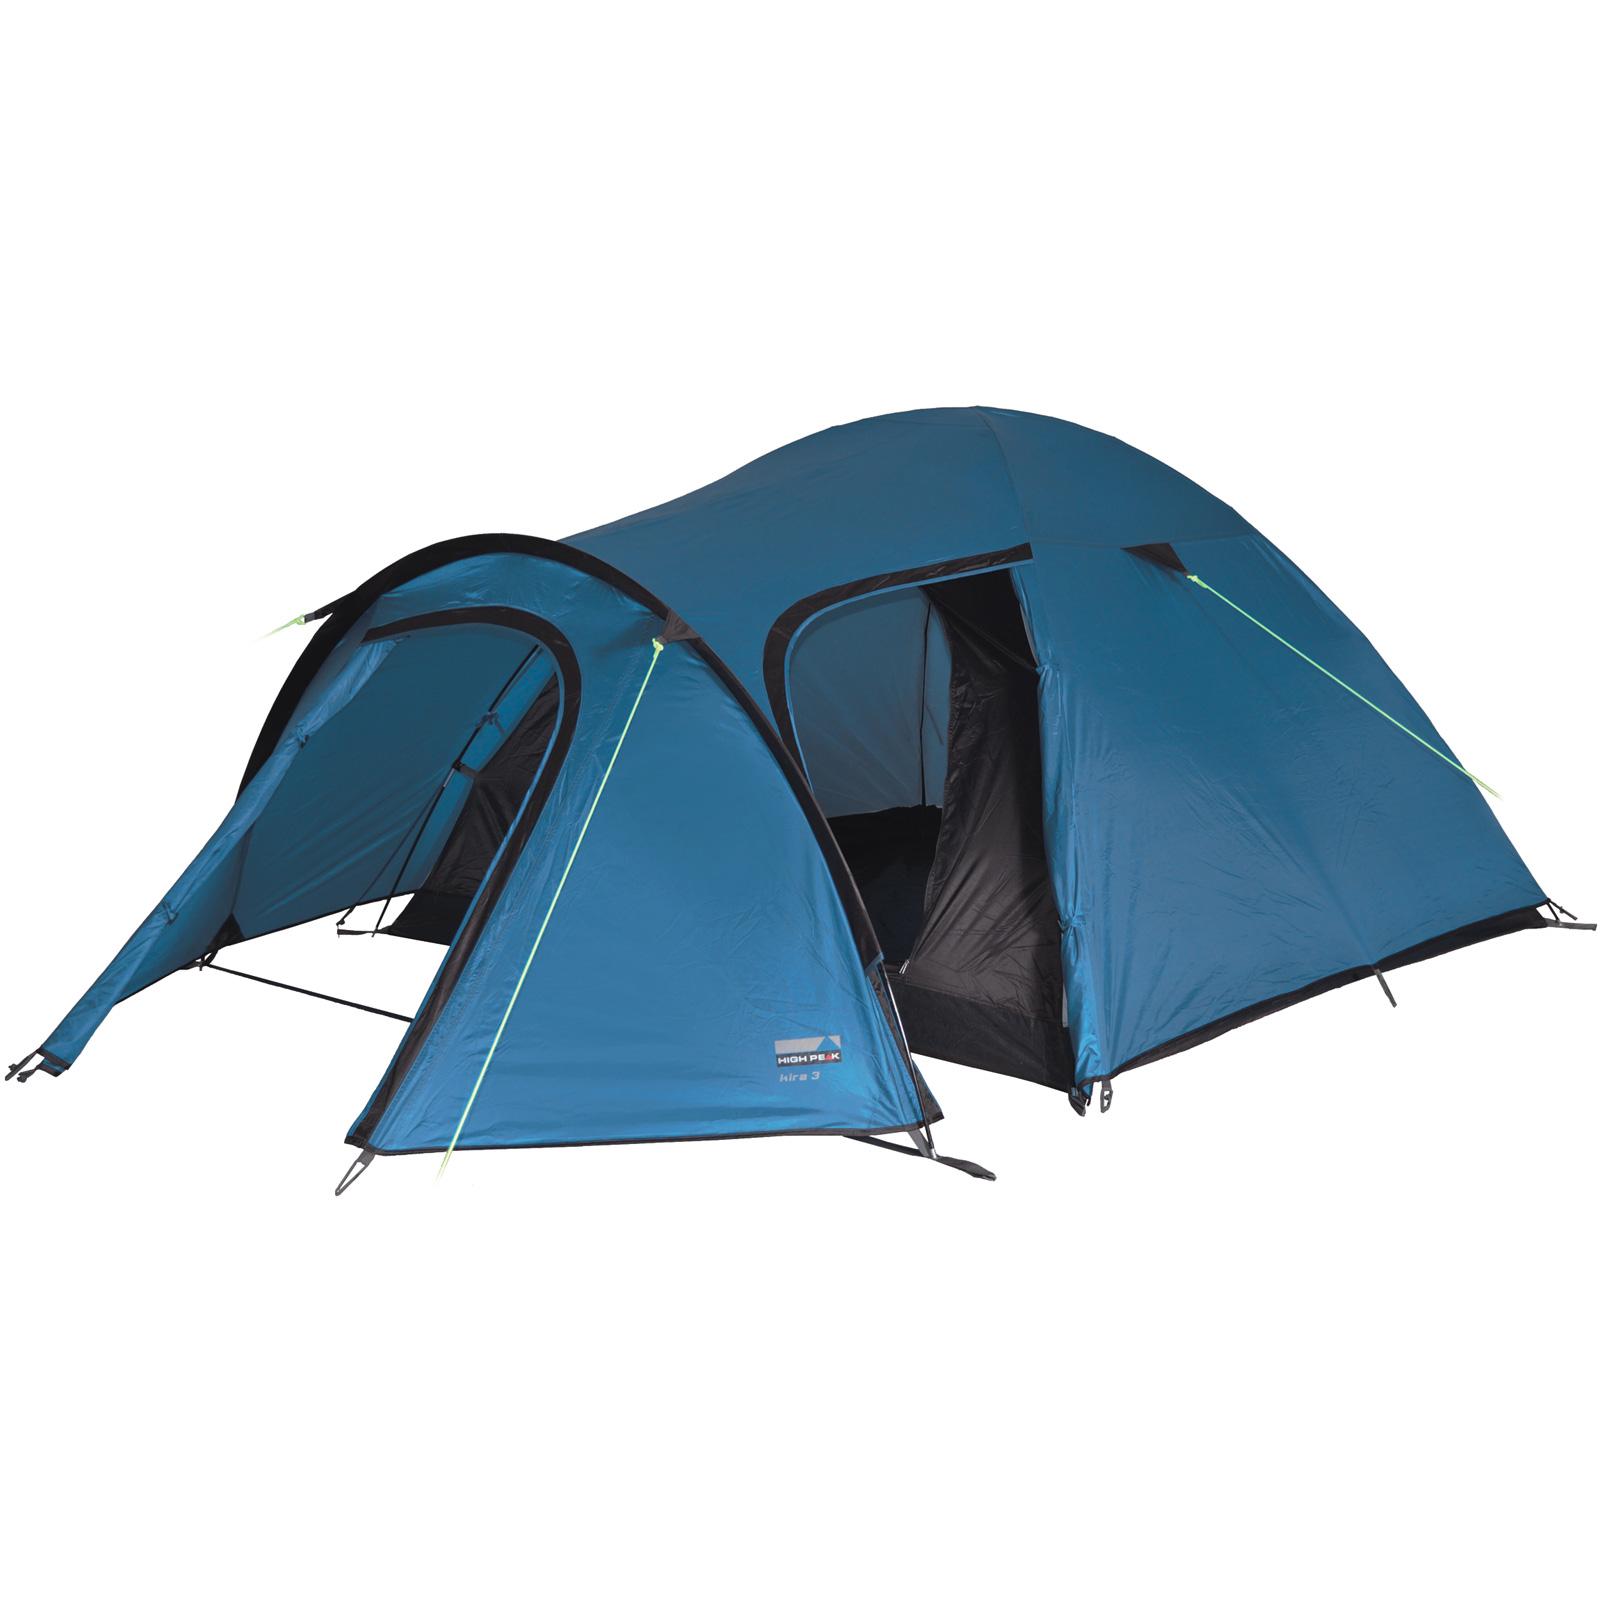 high peak kira 3 personen leichtes kuppelzelt iglu zelt blau neu ebay. Black Bedroom Furniture Sets. Home Design Ideas